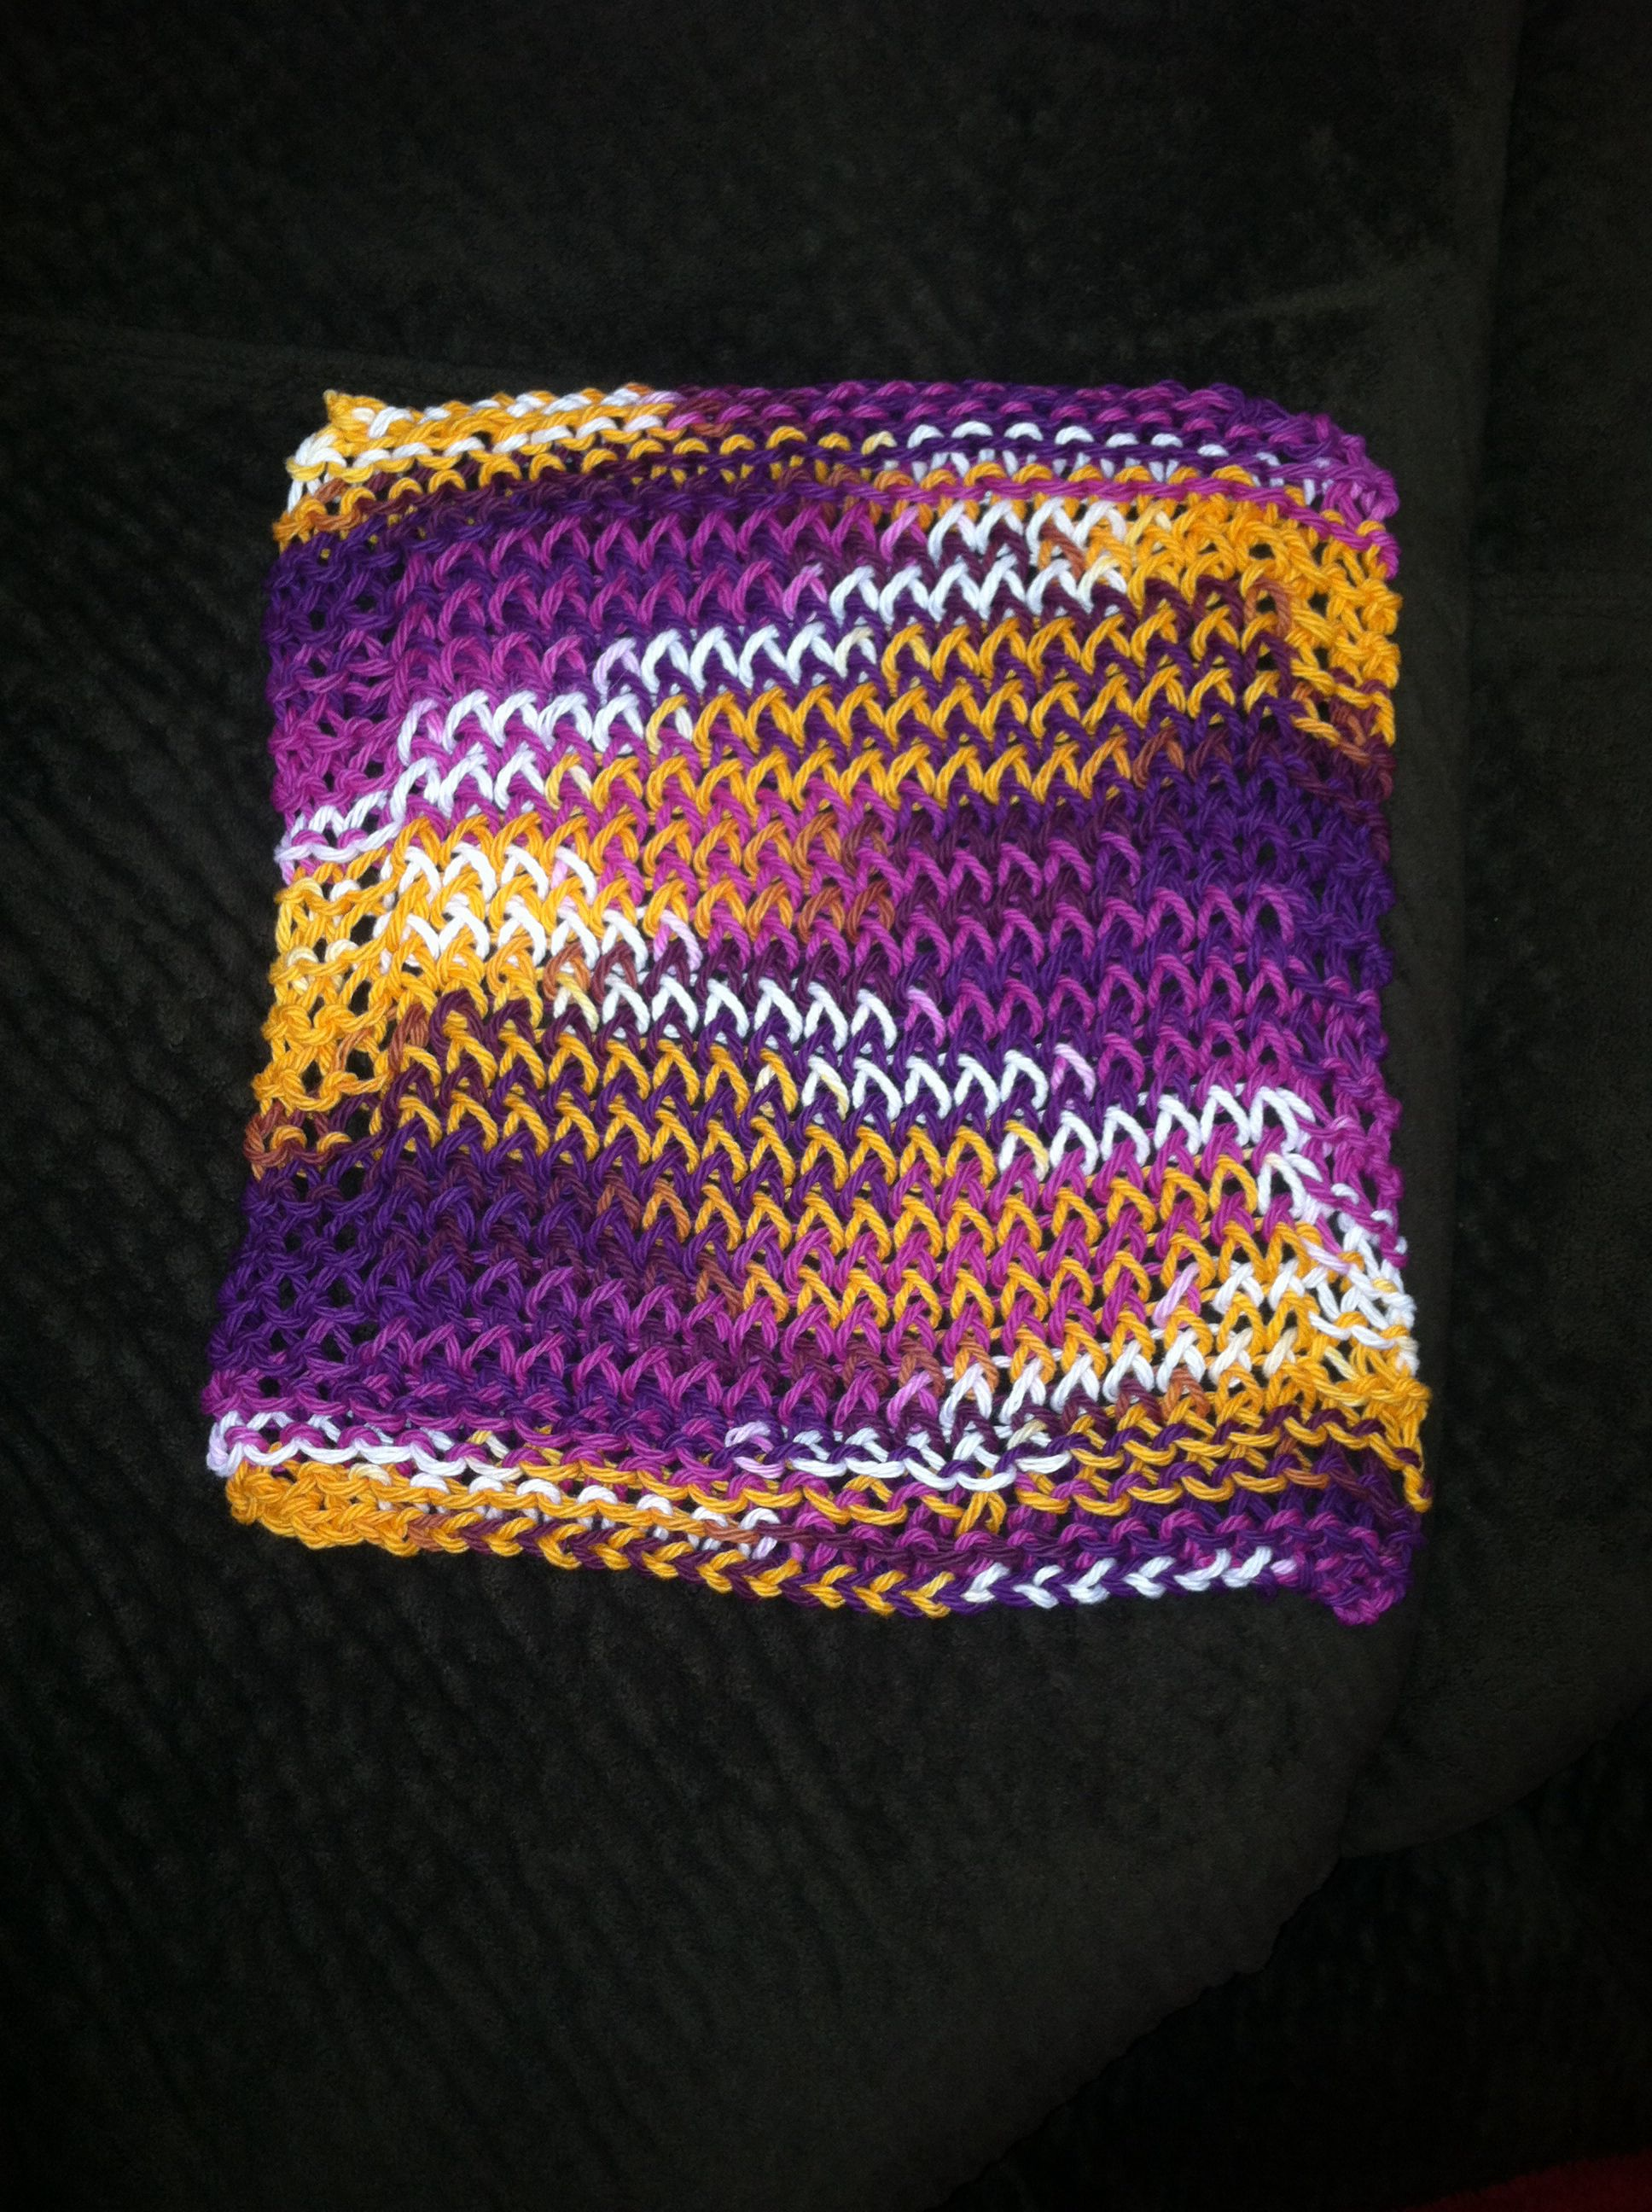 Dishcloth Loom Knitting Knitting Loom Knitting Loom